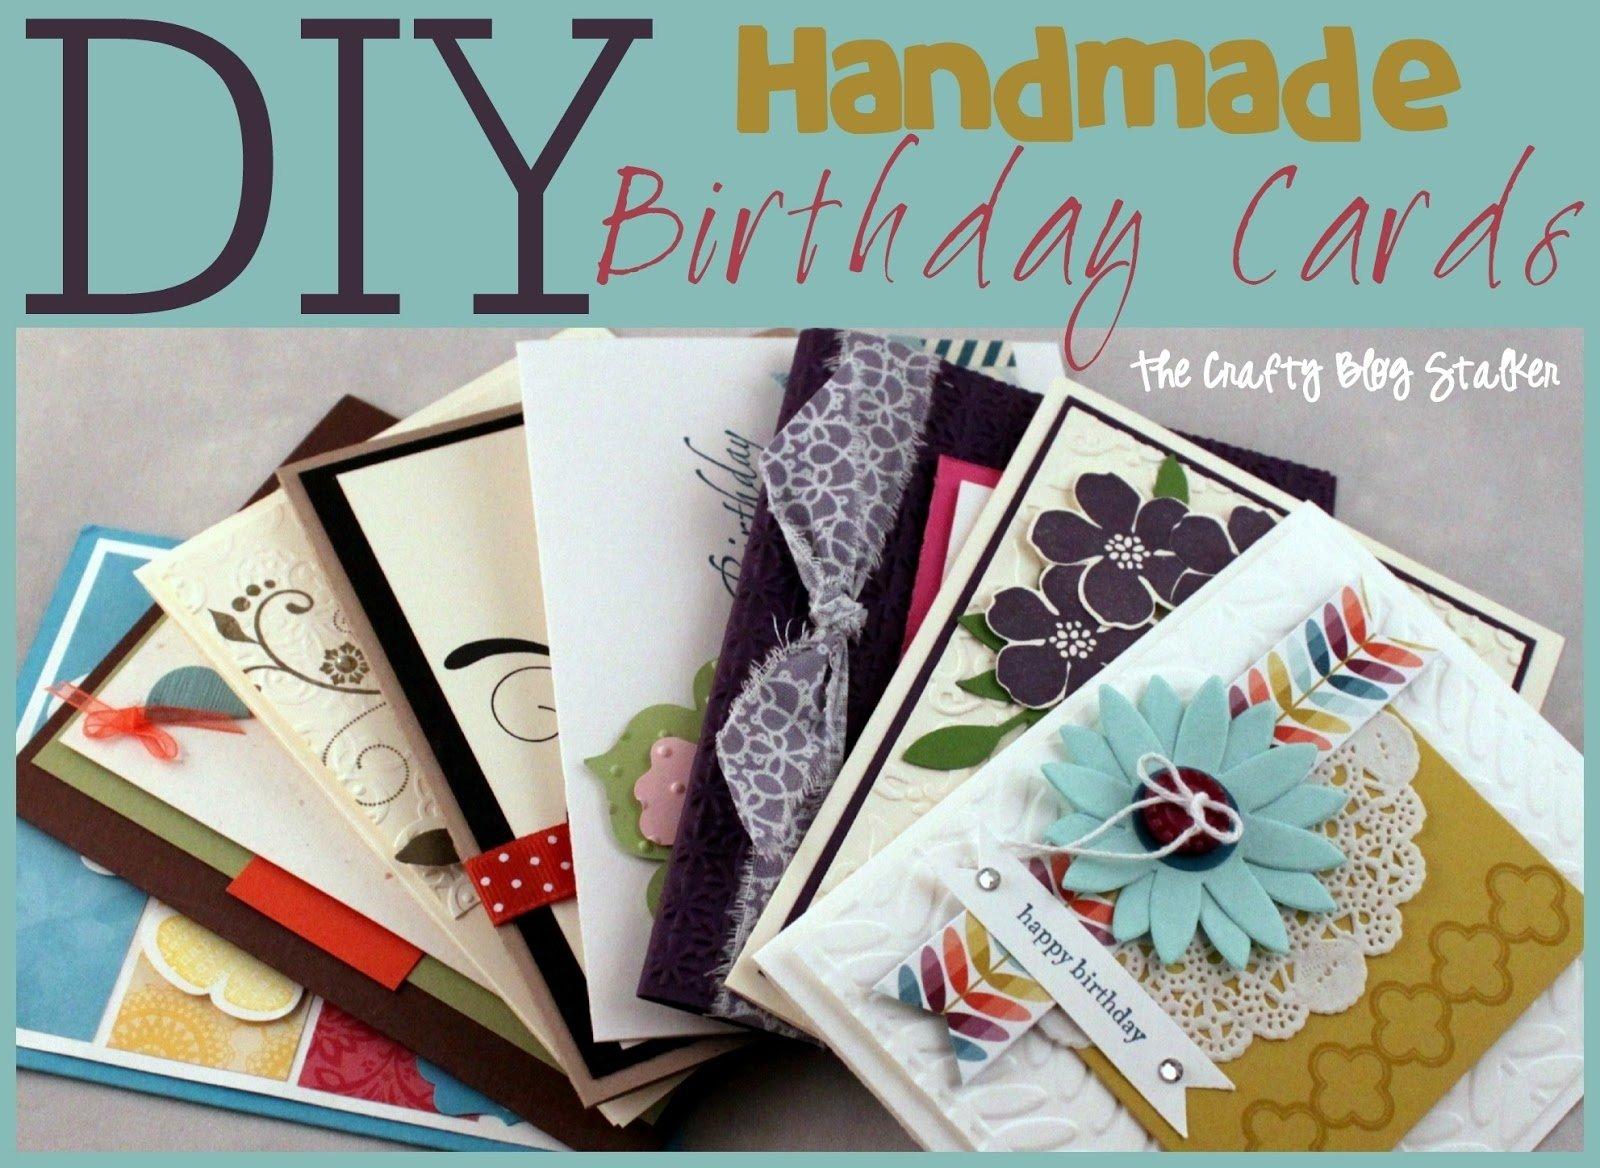 10 Unique Ideas For Handmade Birthday Cards handmade birthday card ideas the crafty blog stalker 2021